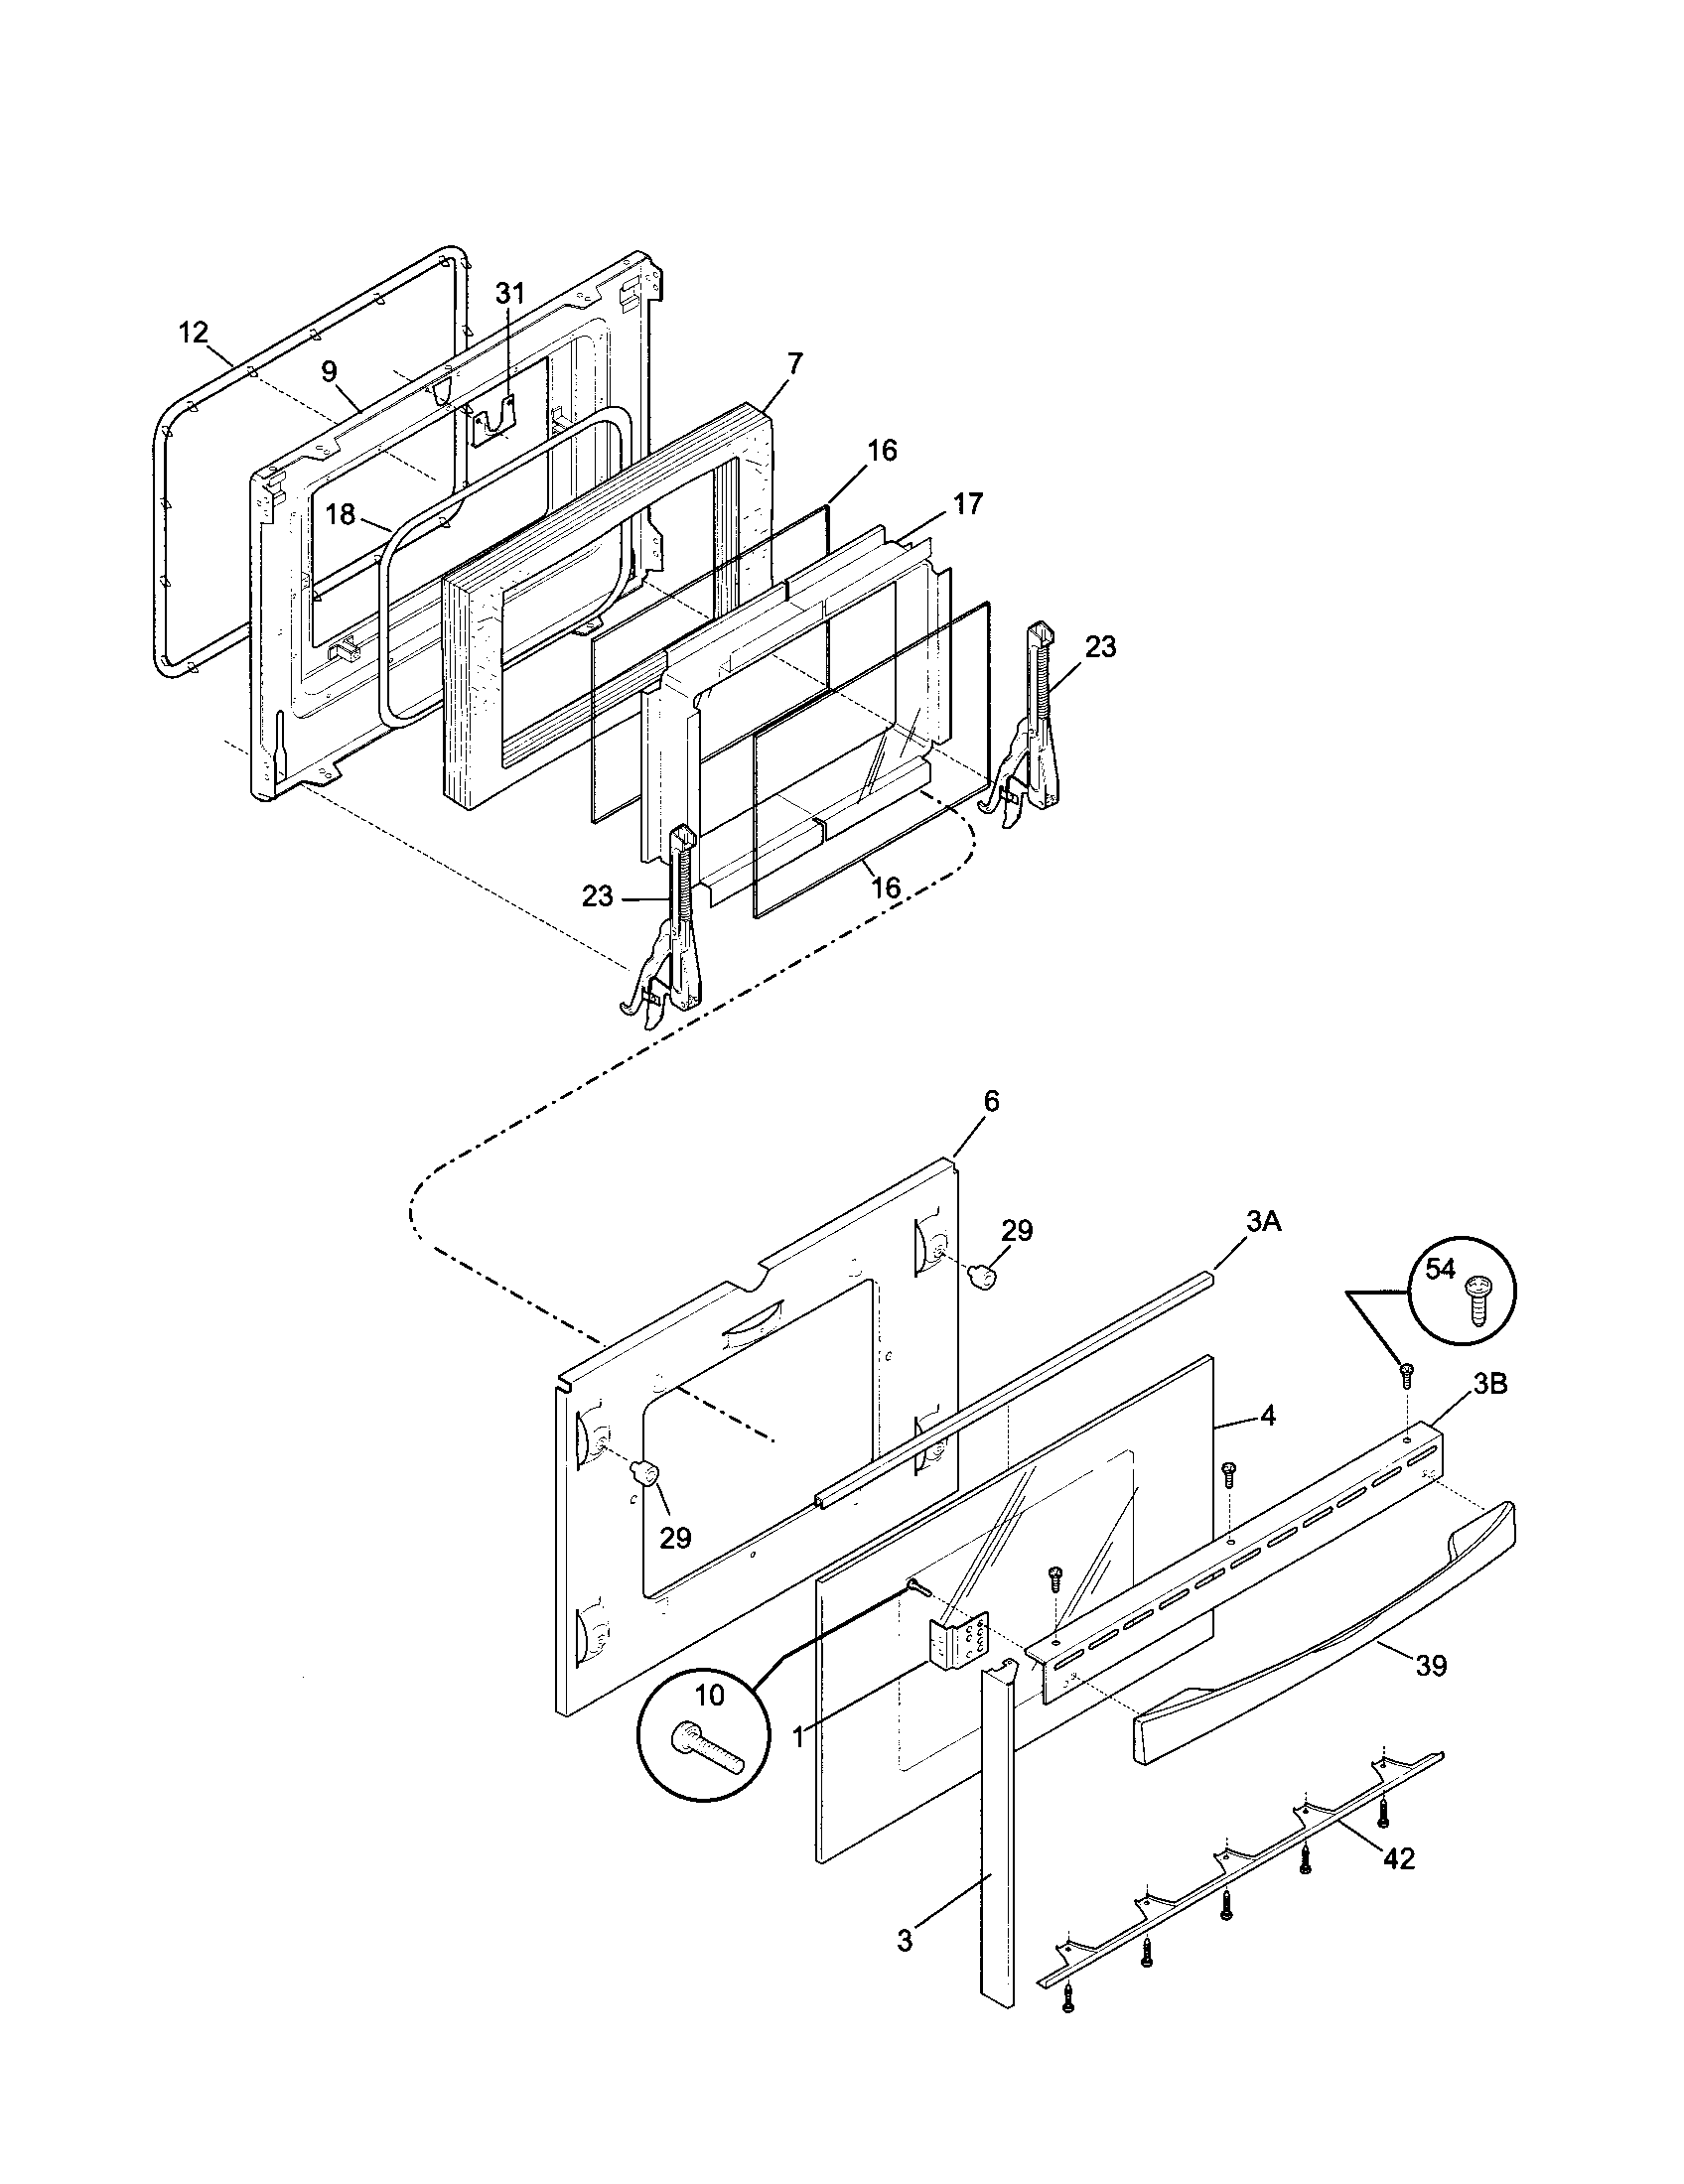 79046819992 elite dual fuel slide in range door parts diagram wiring parts diagram